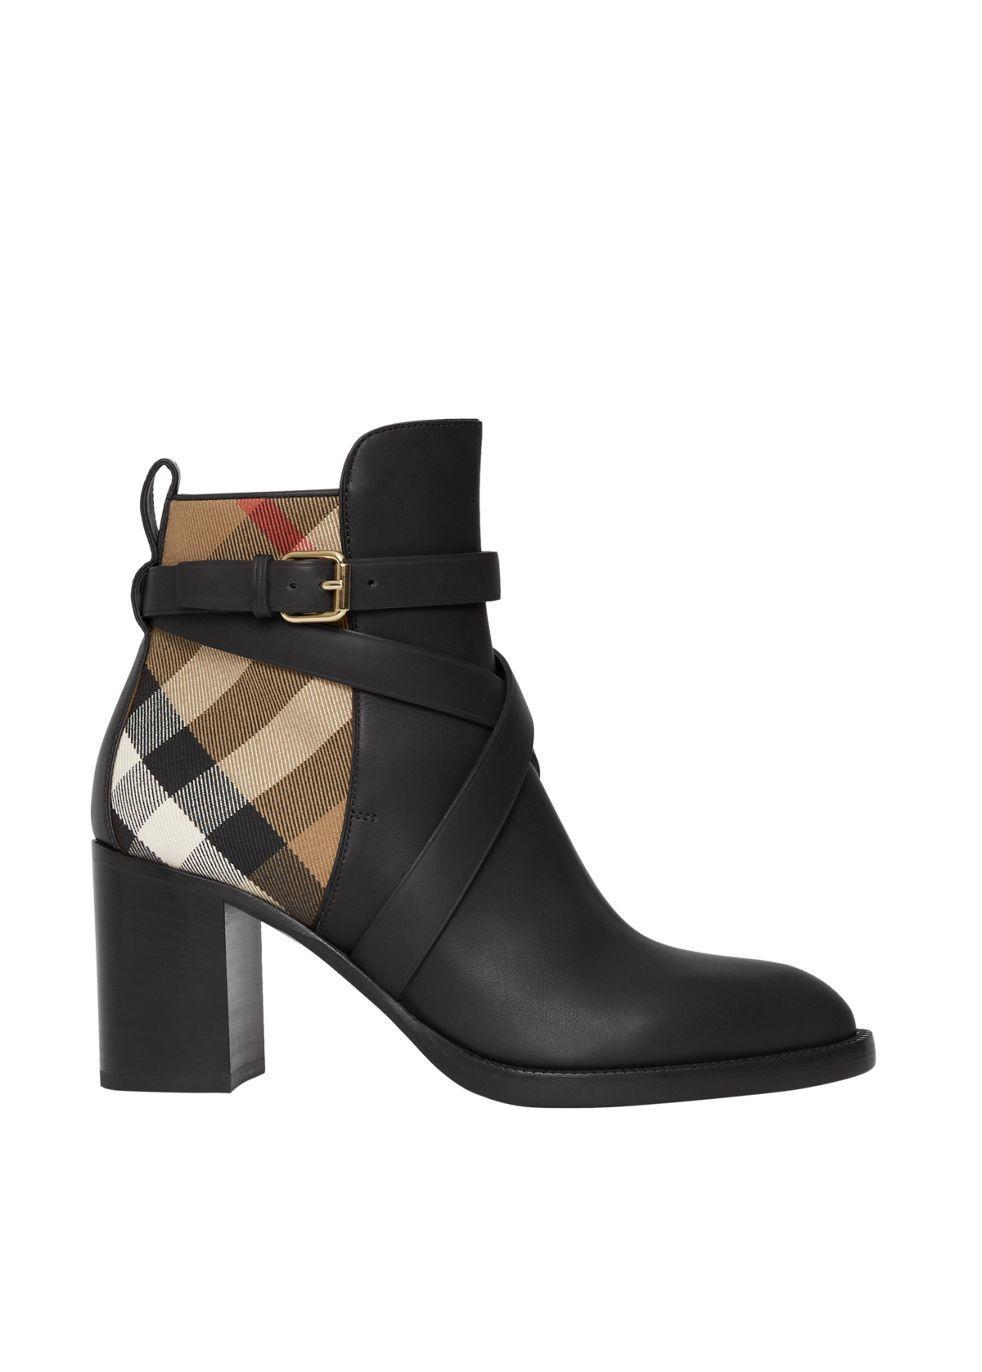 Burberry Women's Boots - Harvey Nichols